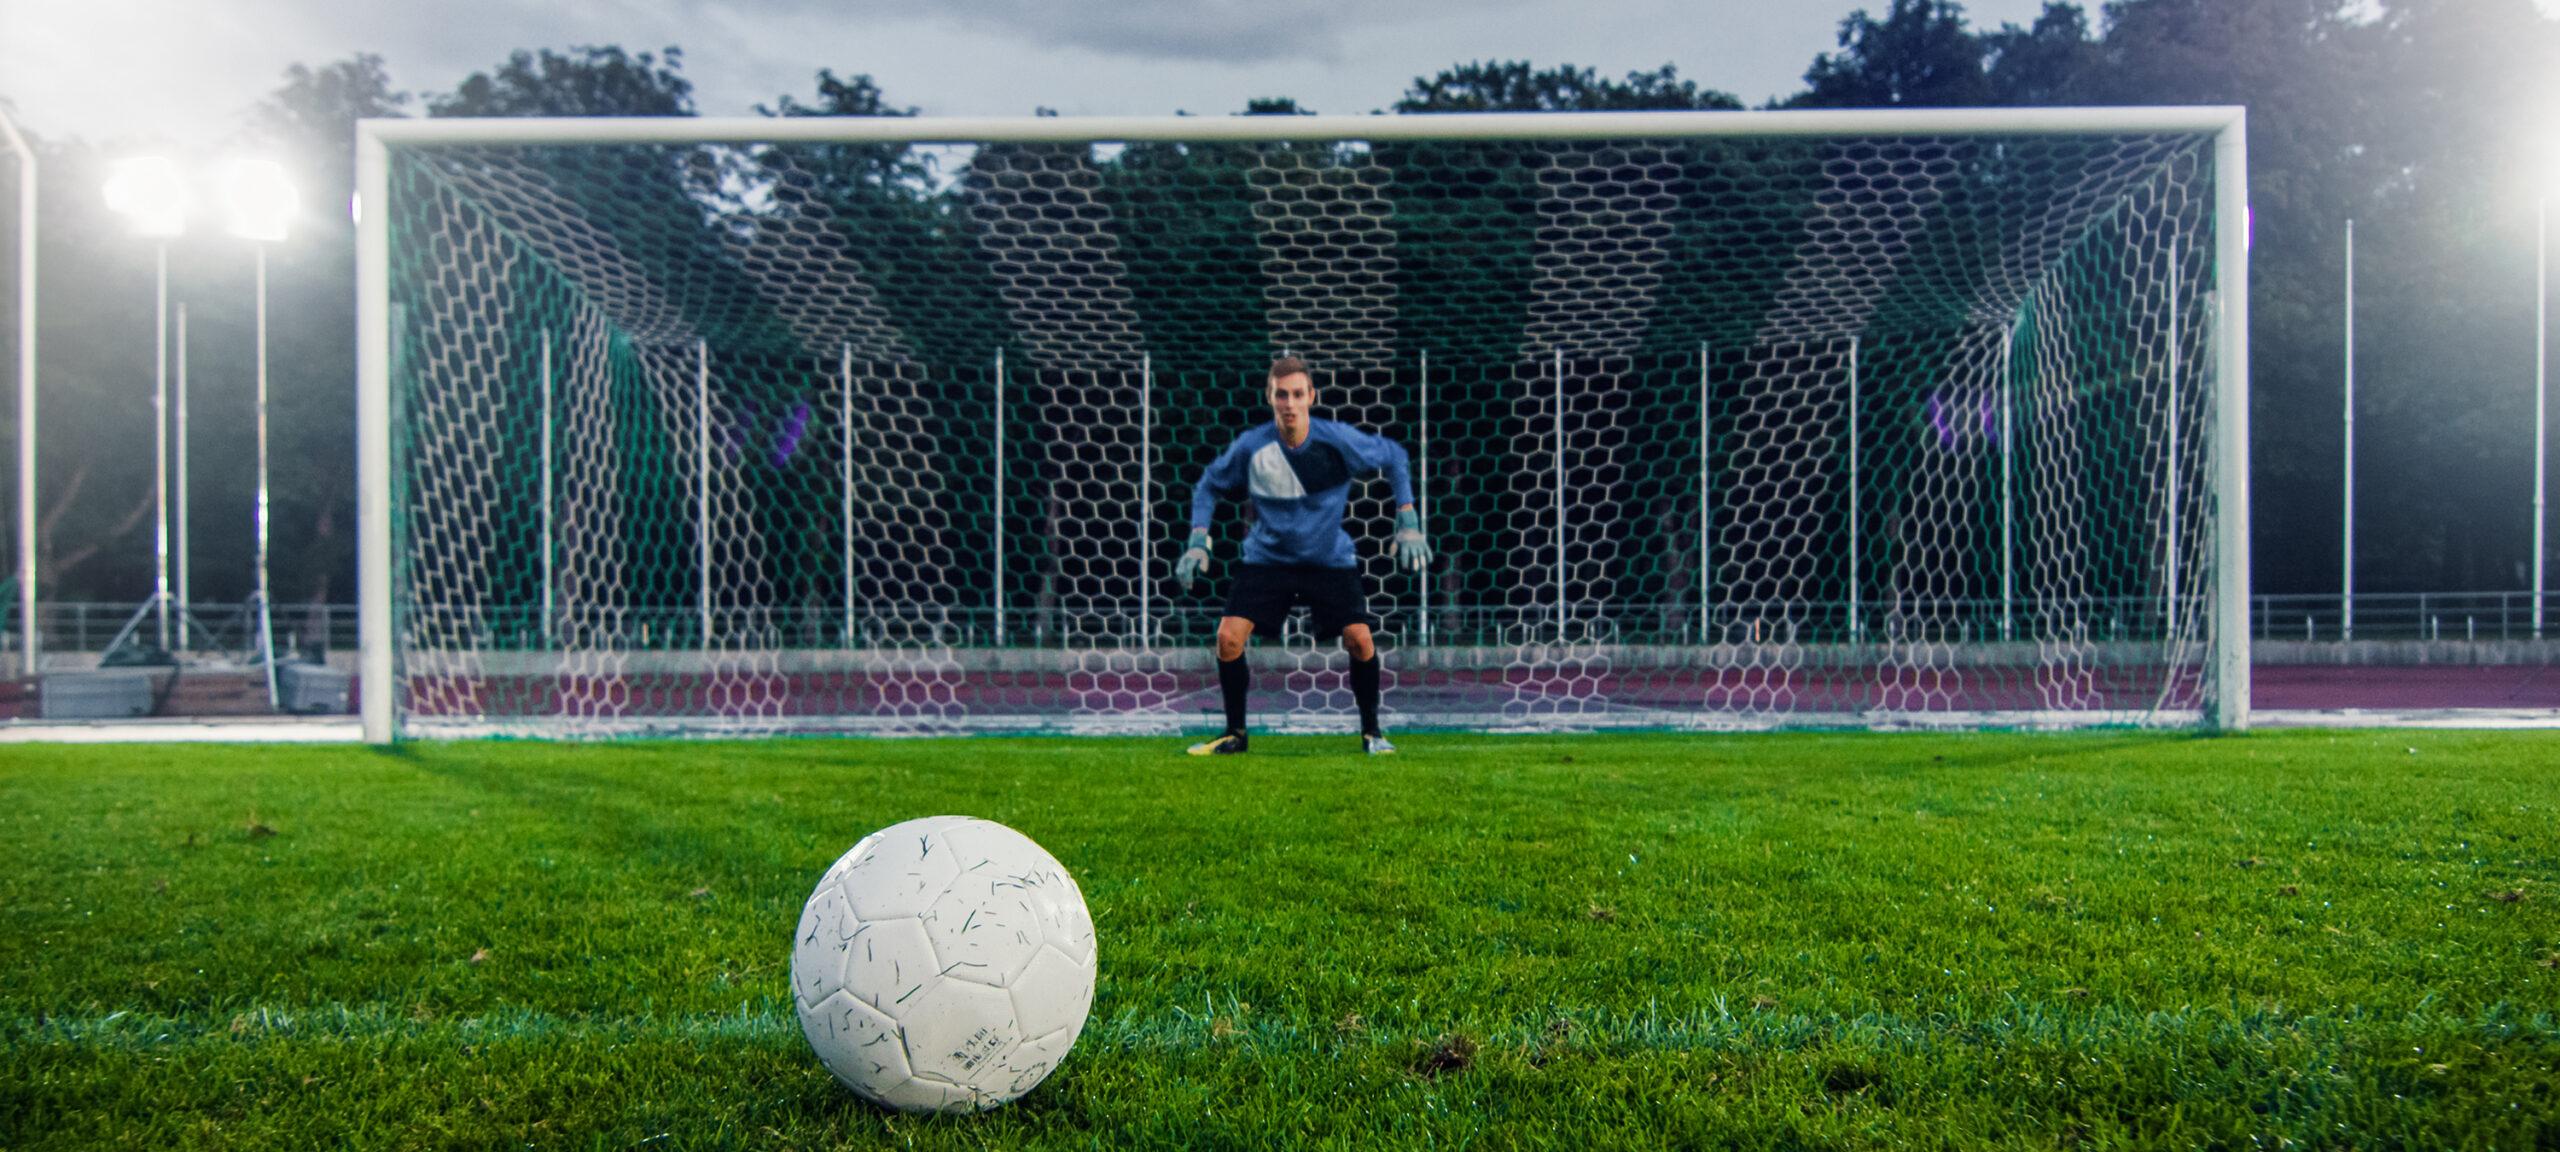 Keepershandschoenen - blogs 1